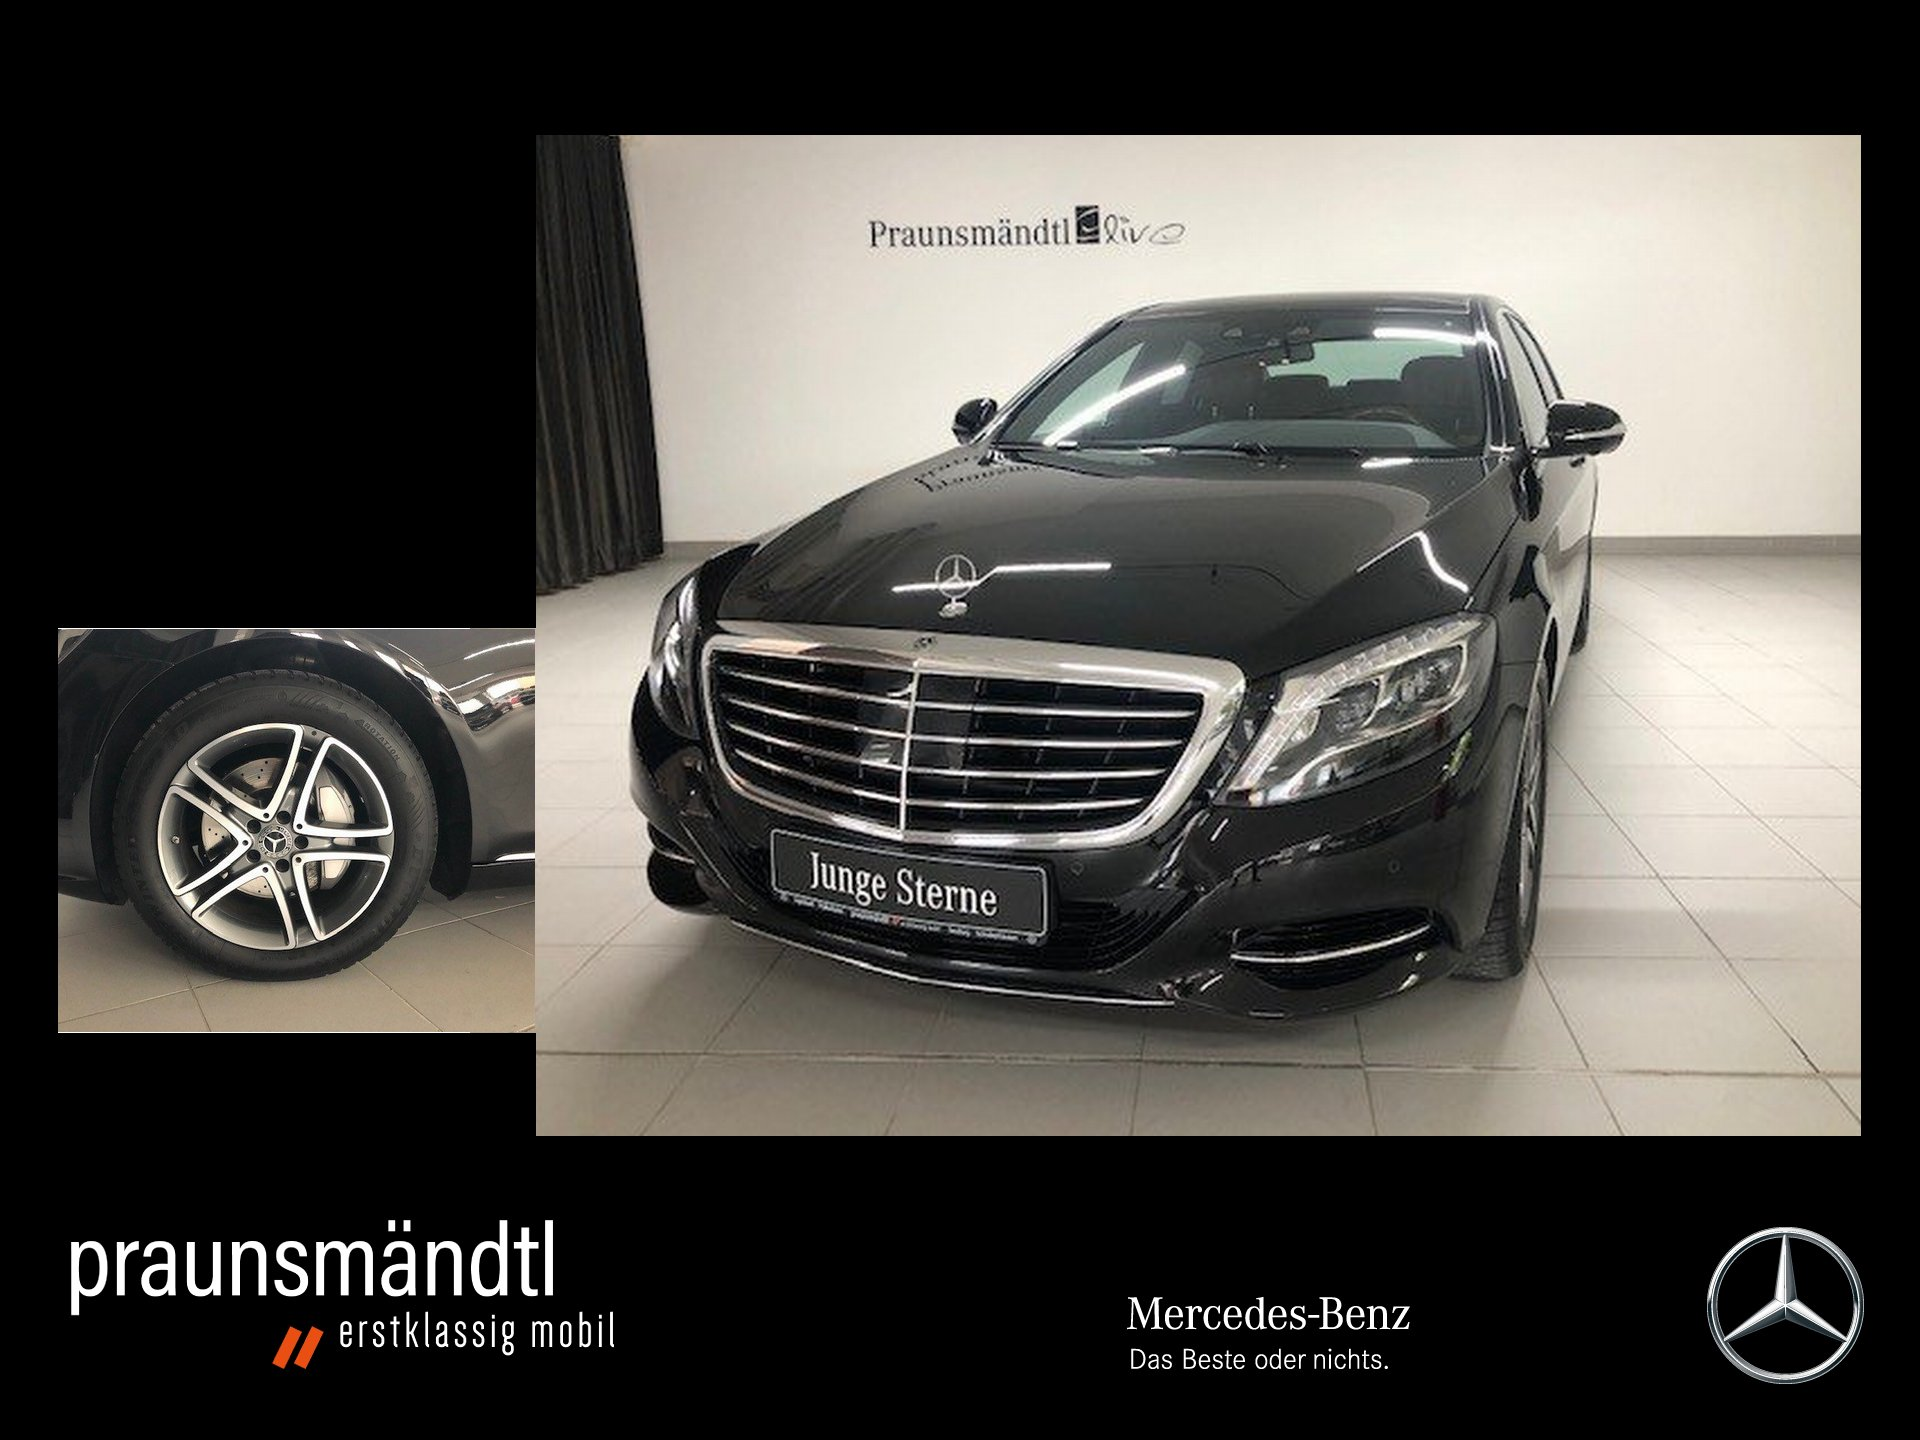 Mercedes-Benz S 350 d LED/Pano/360/Chauffeur/Distro./AHK/Sound, Jahr 2017, Diesel